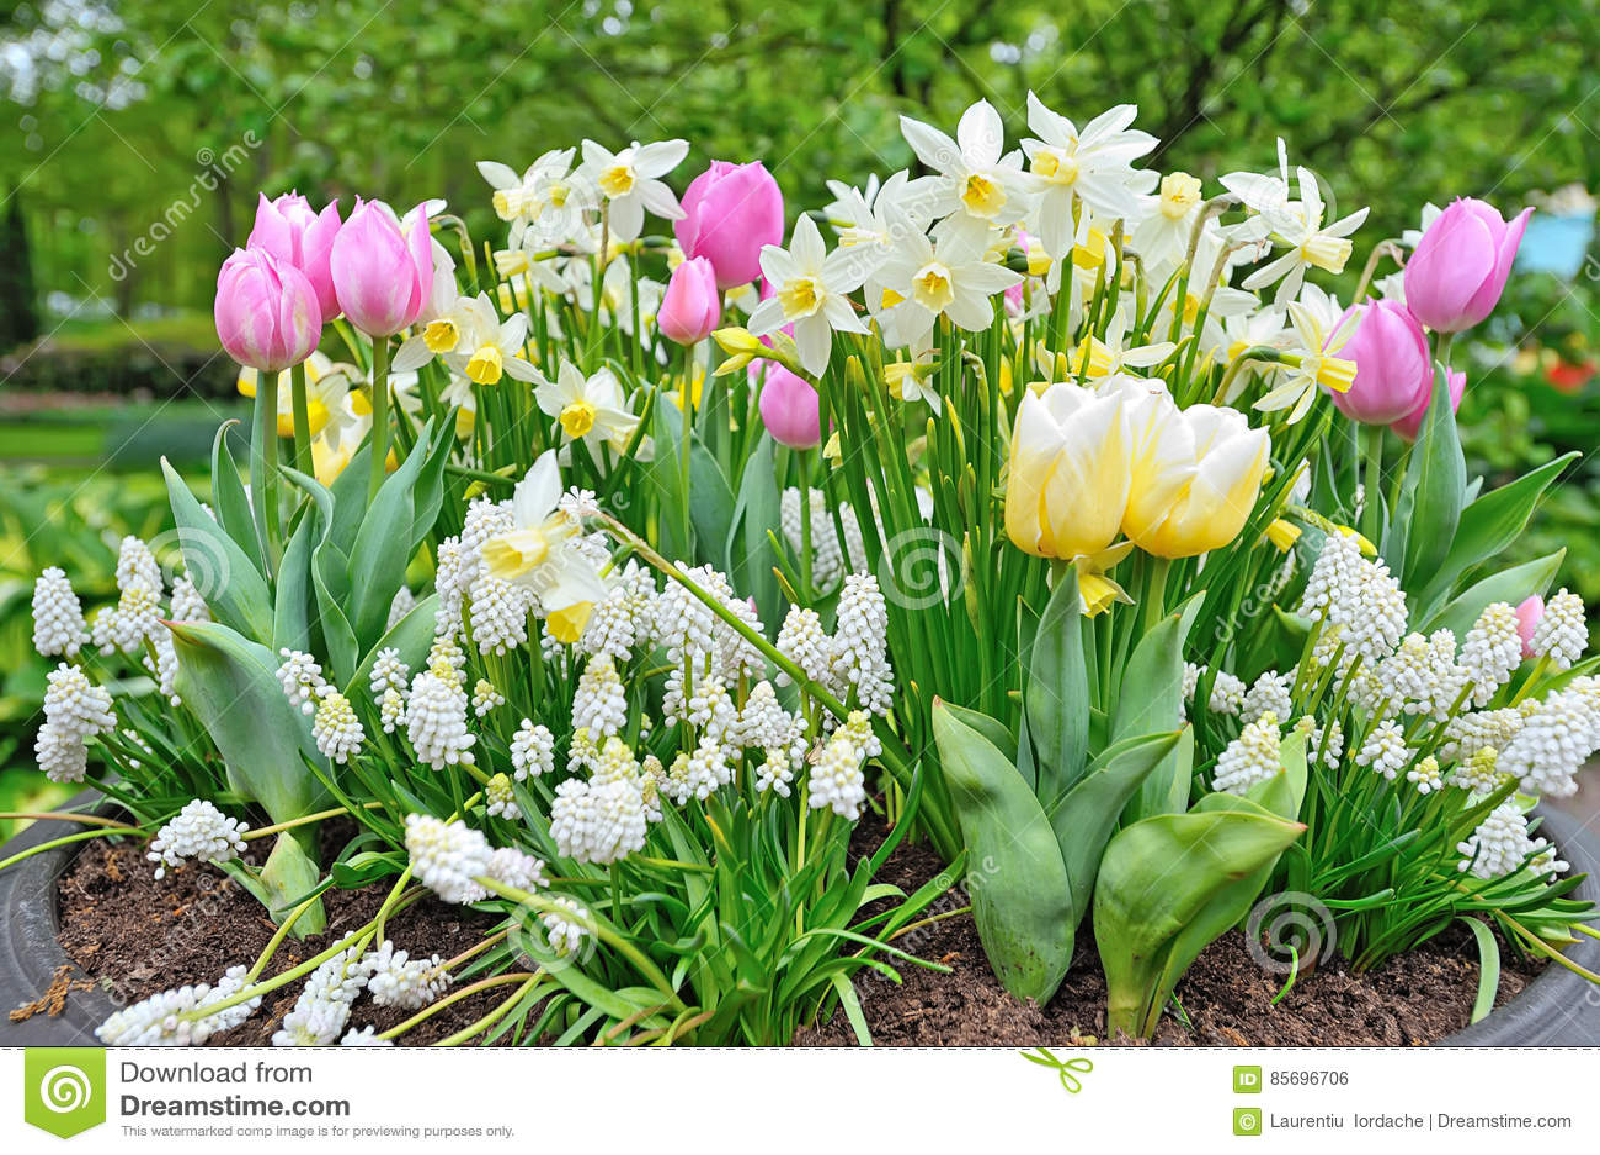 Spring flowers in big vase stock photo image of bloom 85696706 download comp mightylinksfo